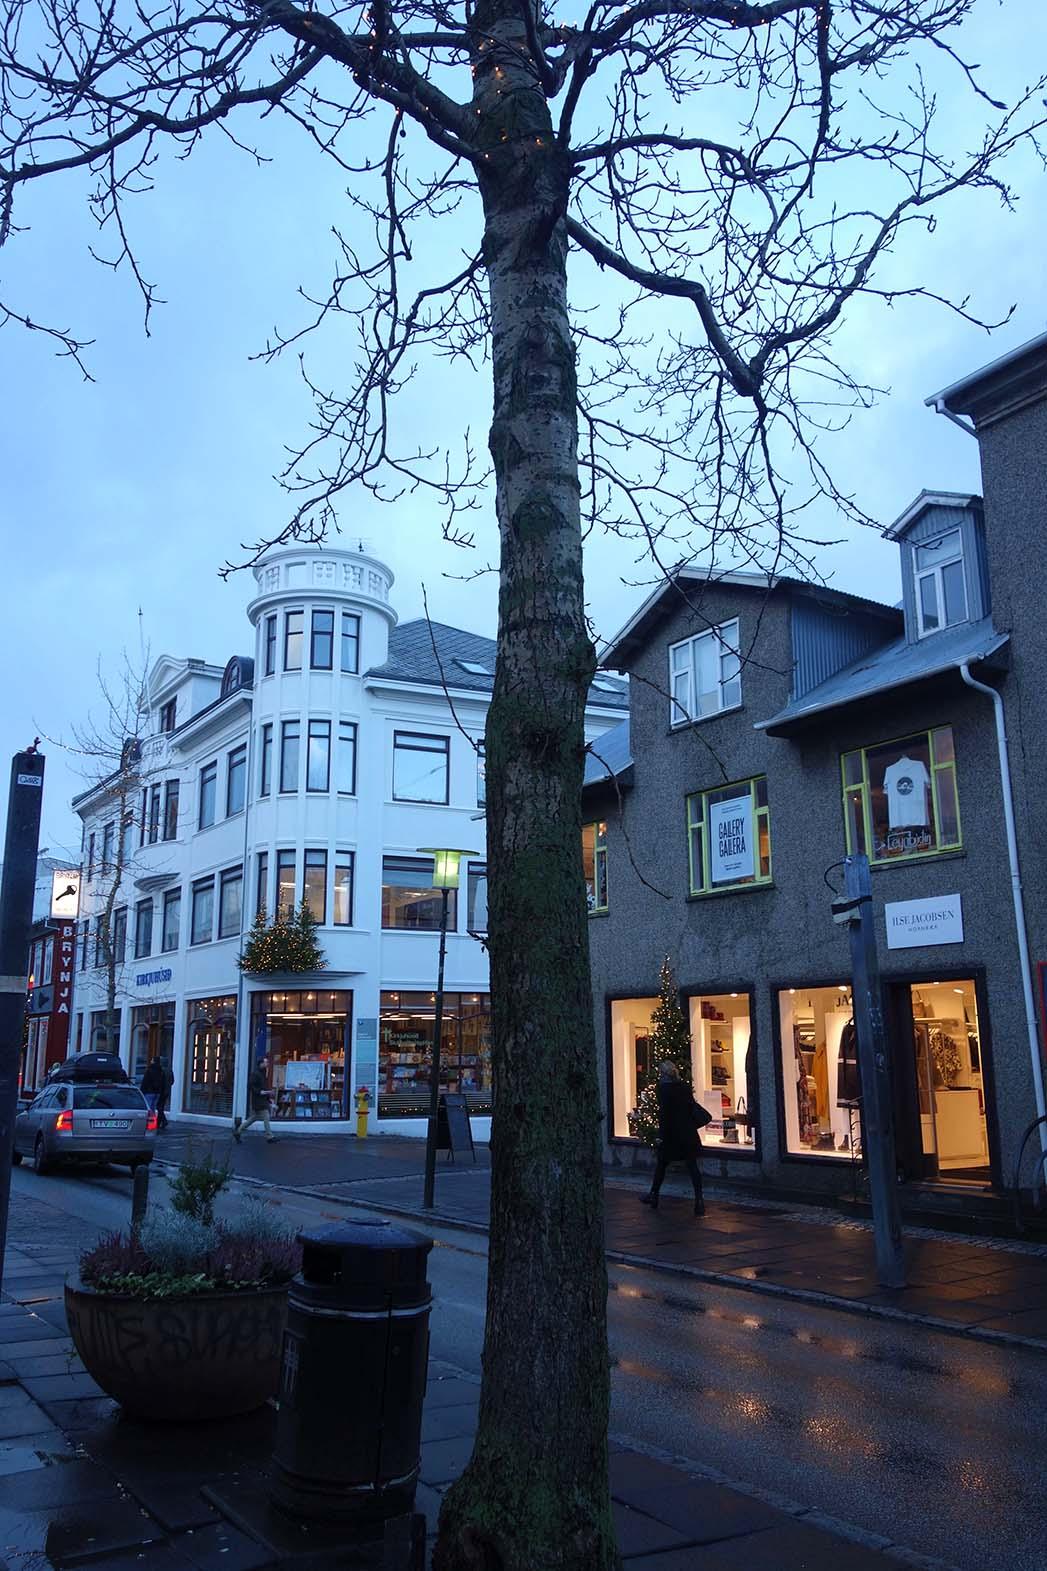 Downtown reykjavik in November